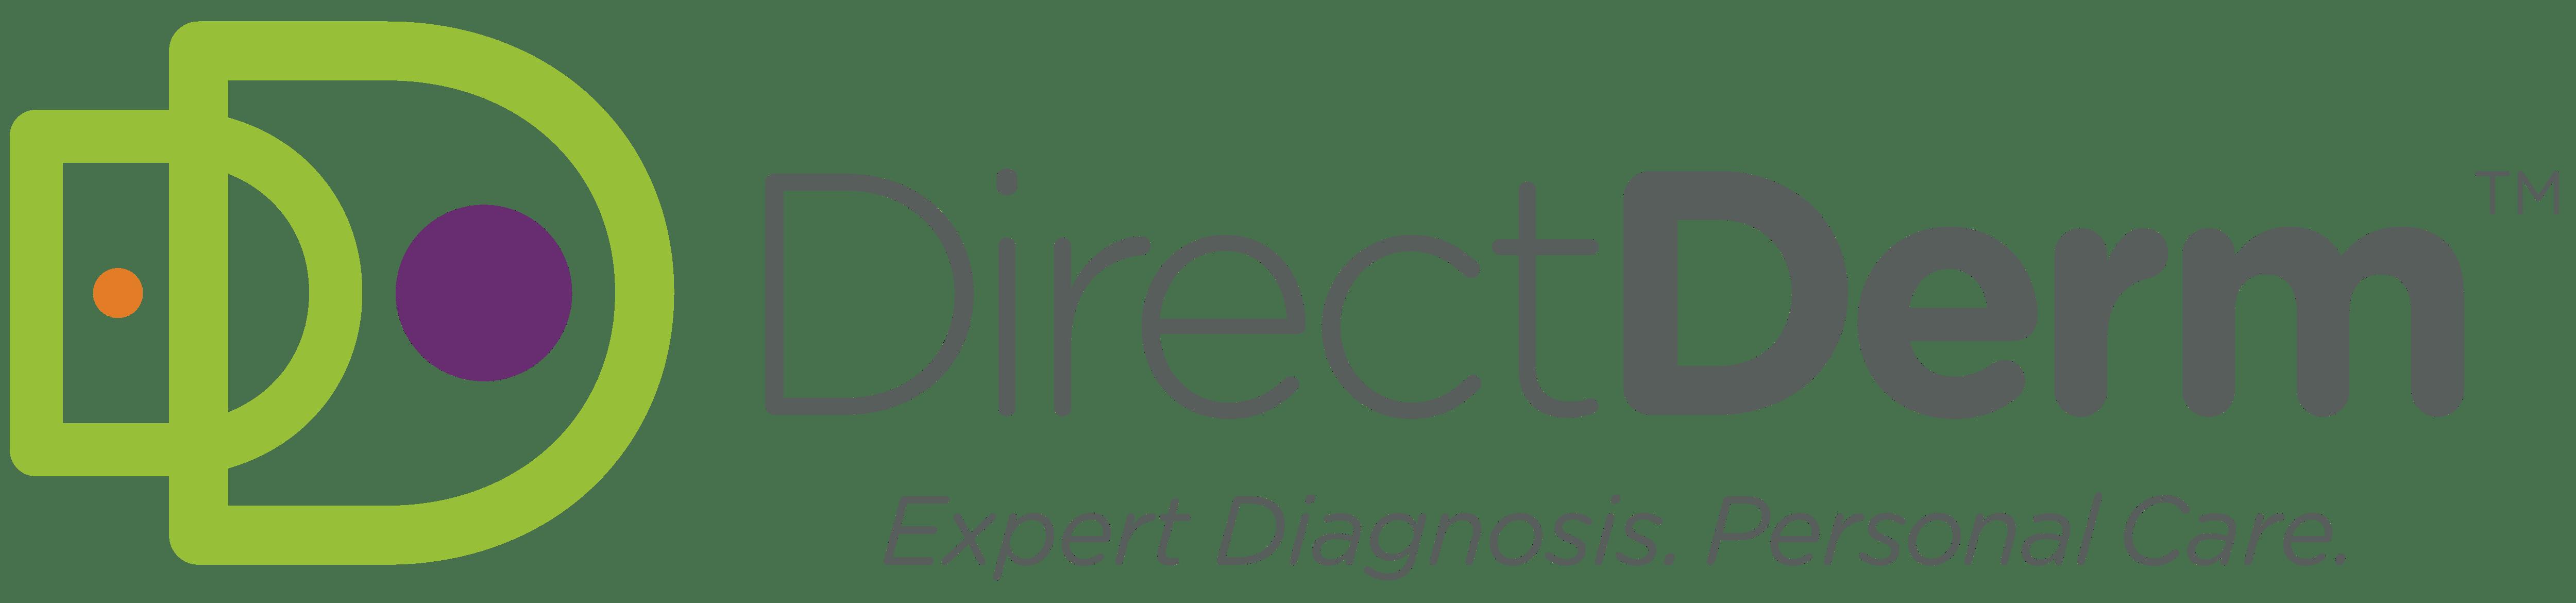 Direct Dermatology company logo